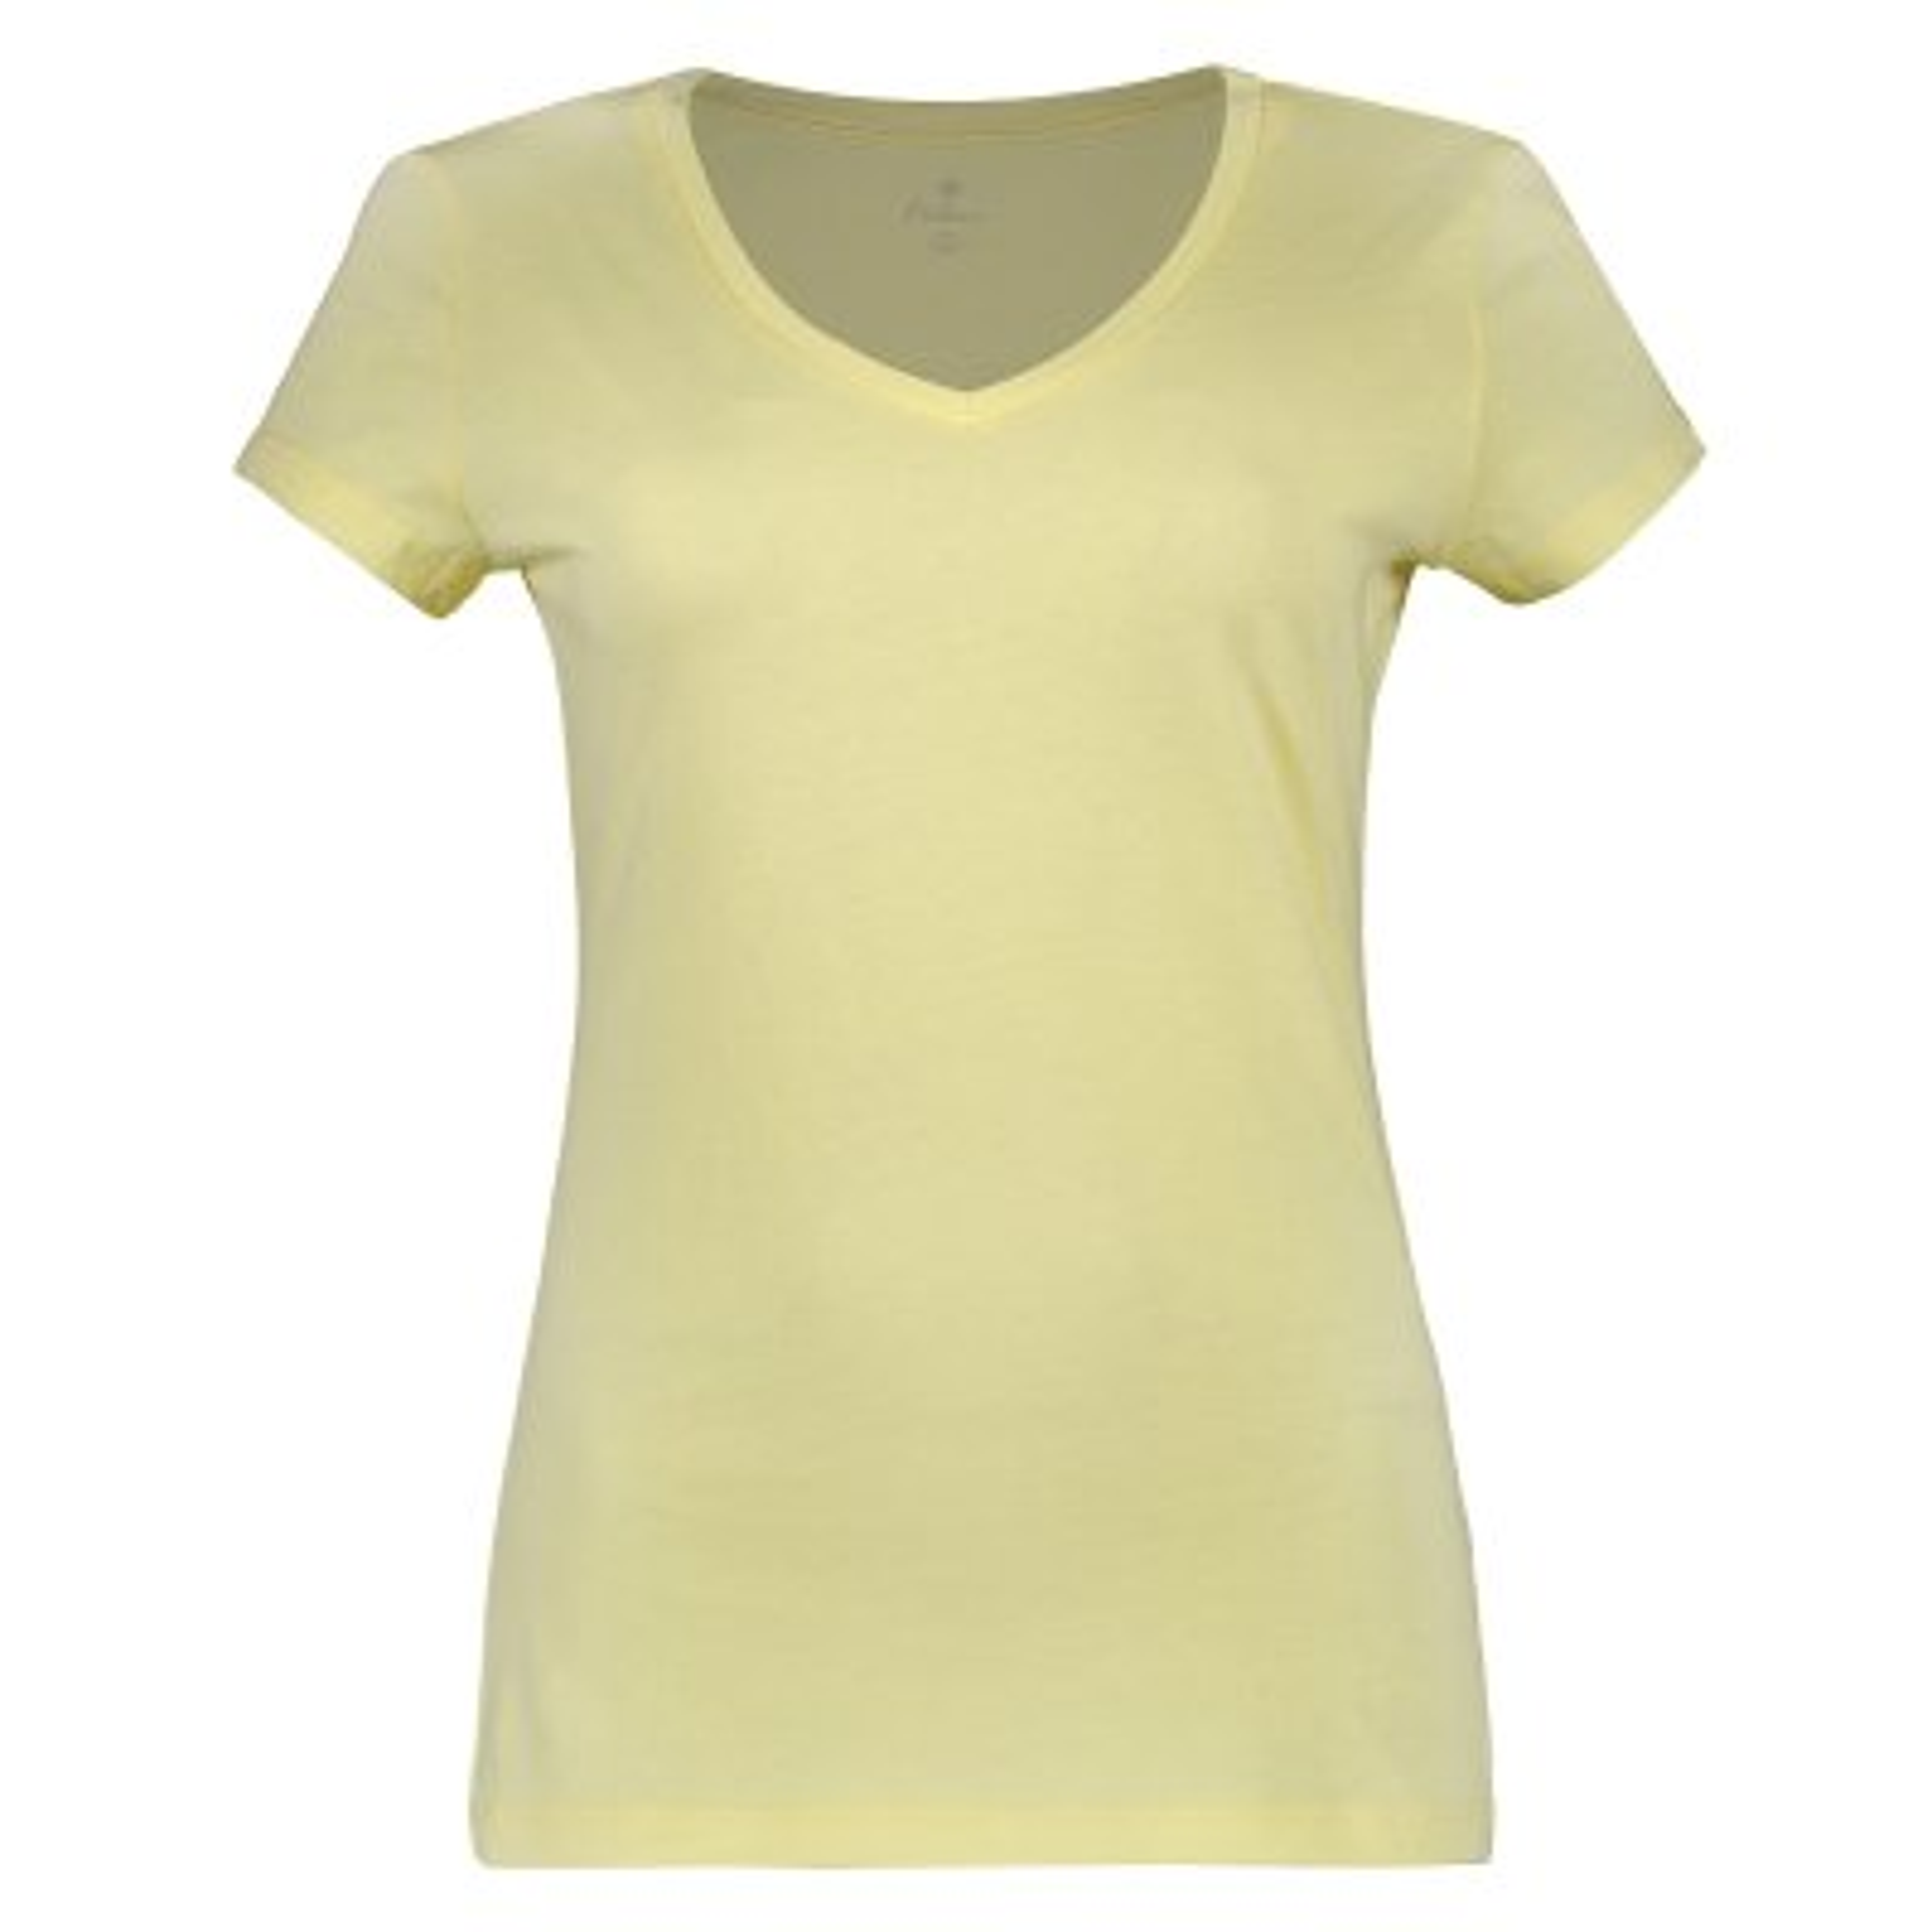 تی شرت زنانه کالینز مدل CL1019324-YELLOW